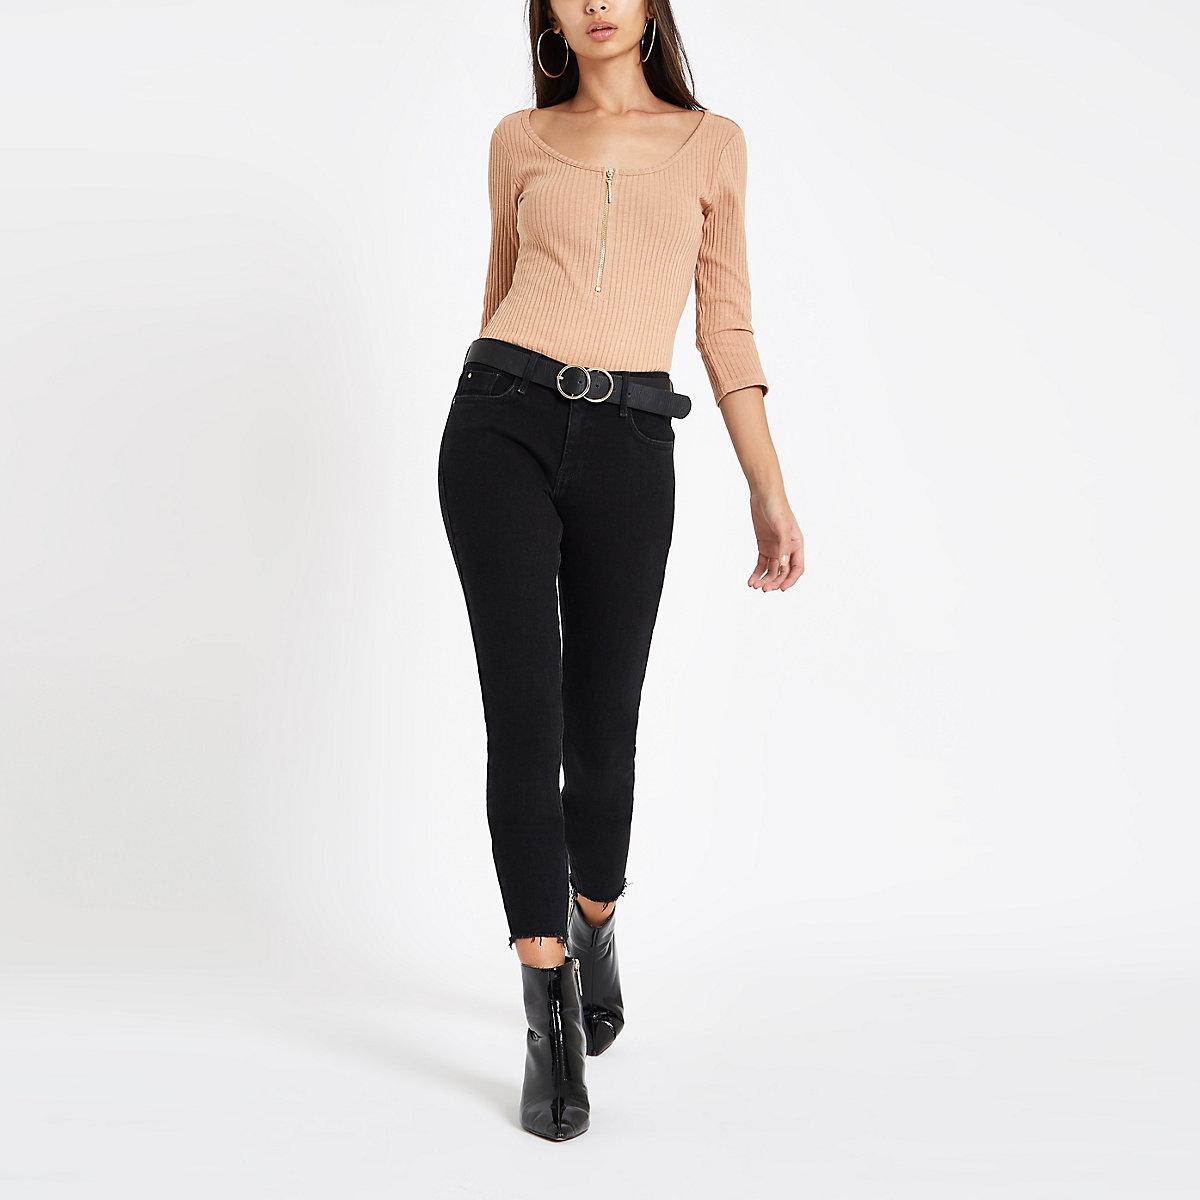 Beige rhinestone zip long sleeve bodysuit